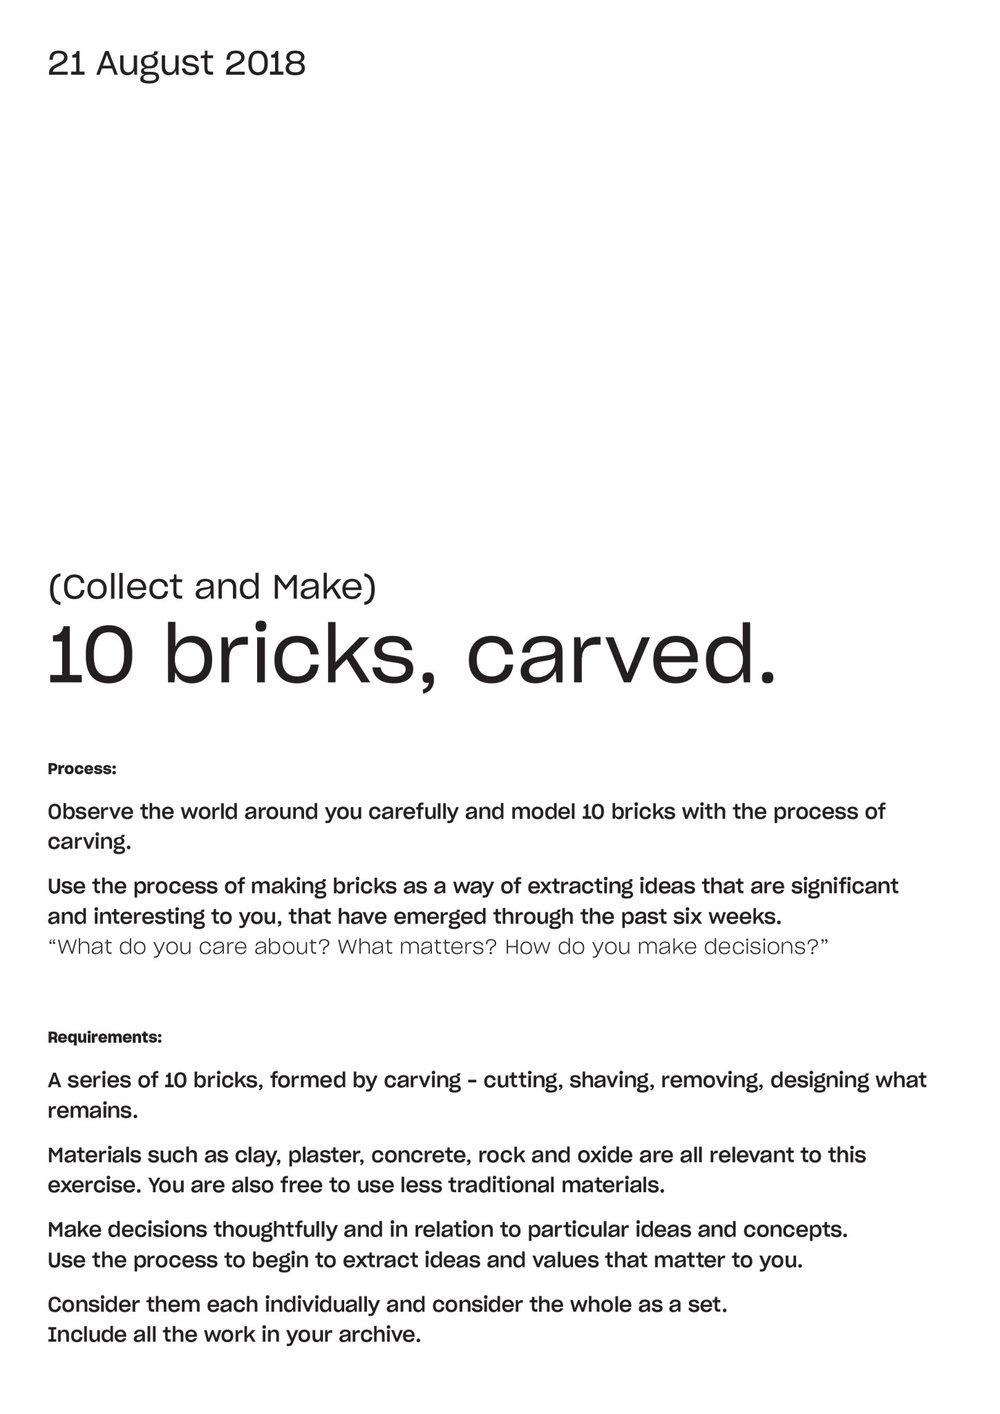 10-bricks,-carved.jpg